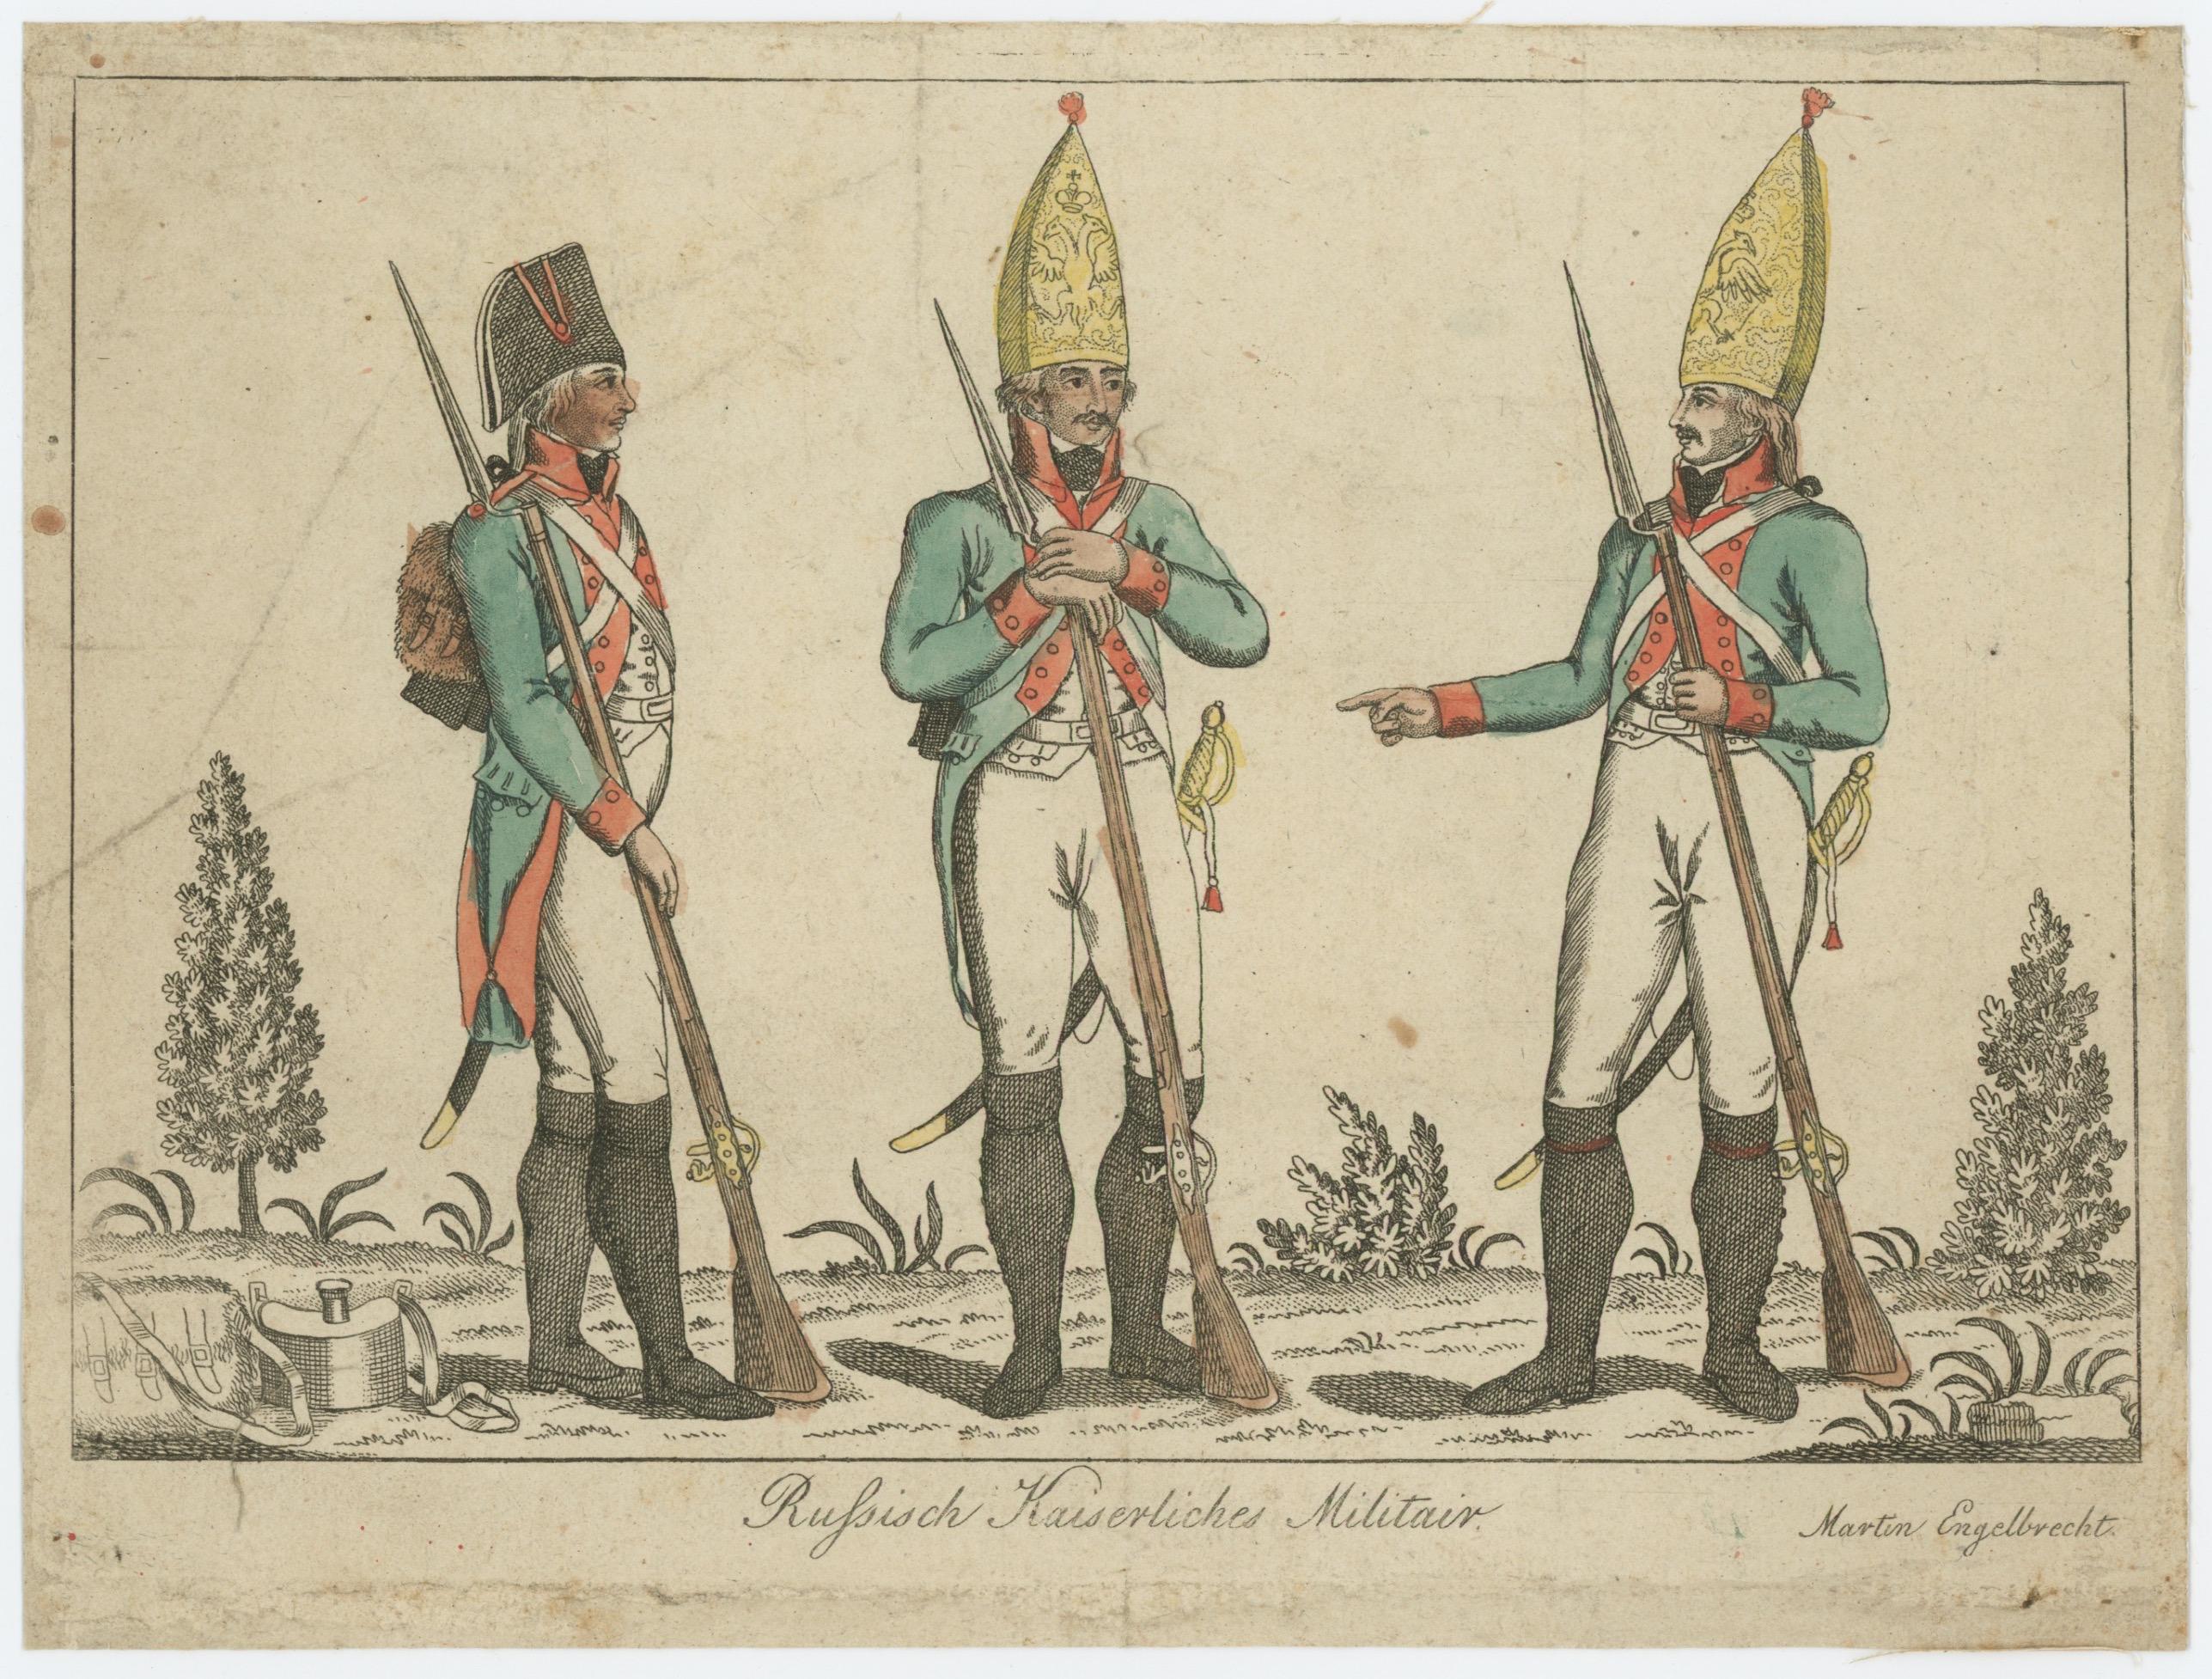 Gravure XVIII - XIX - Troupes Russes - Russich Kaiserliches Militair - Imagerie Anciennes Gravures Martin Engelbercht - Uniforme